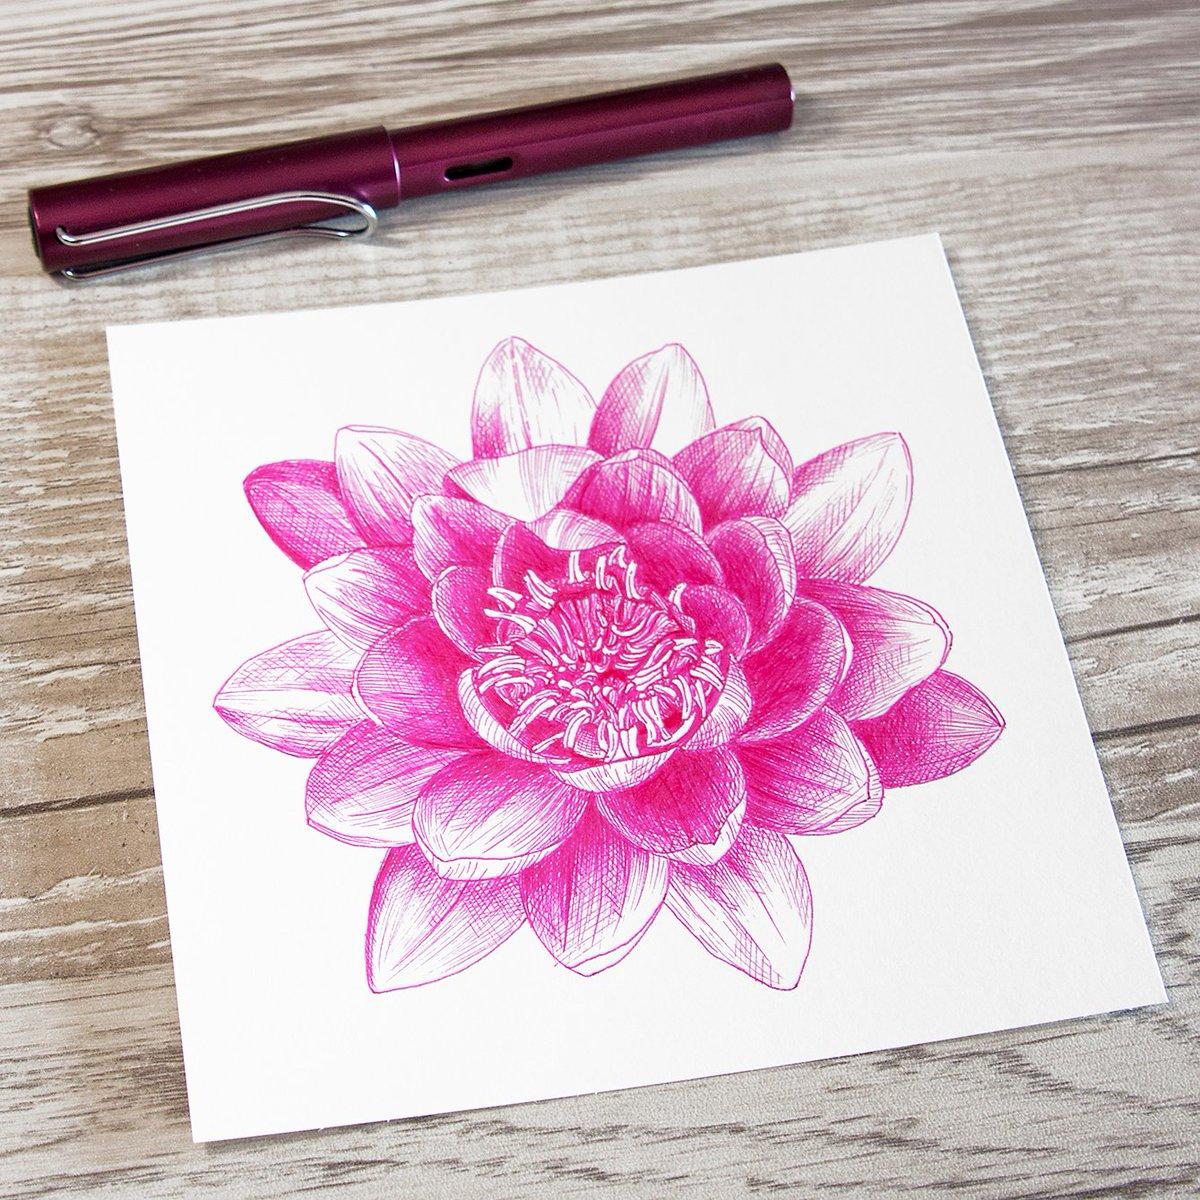 Ya no me acuerdo... #drawingflowers #inkdrawing #fountainpendrawing #fountainpen #fountainpenink #fountainpenaddict #lamy #lamyfountainpen #lamyalstar #diamineink #pinkhope #cansonpaper #cansonimagine #dibujoatinta #papelcanson #flordeloto #lotusflower #igerszgz #instasketch pic.twitter.com/knoSASRsJT